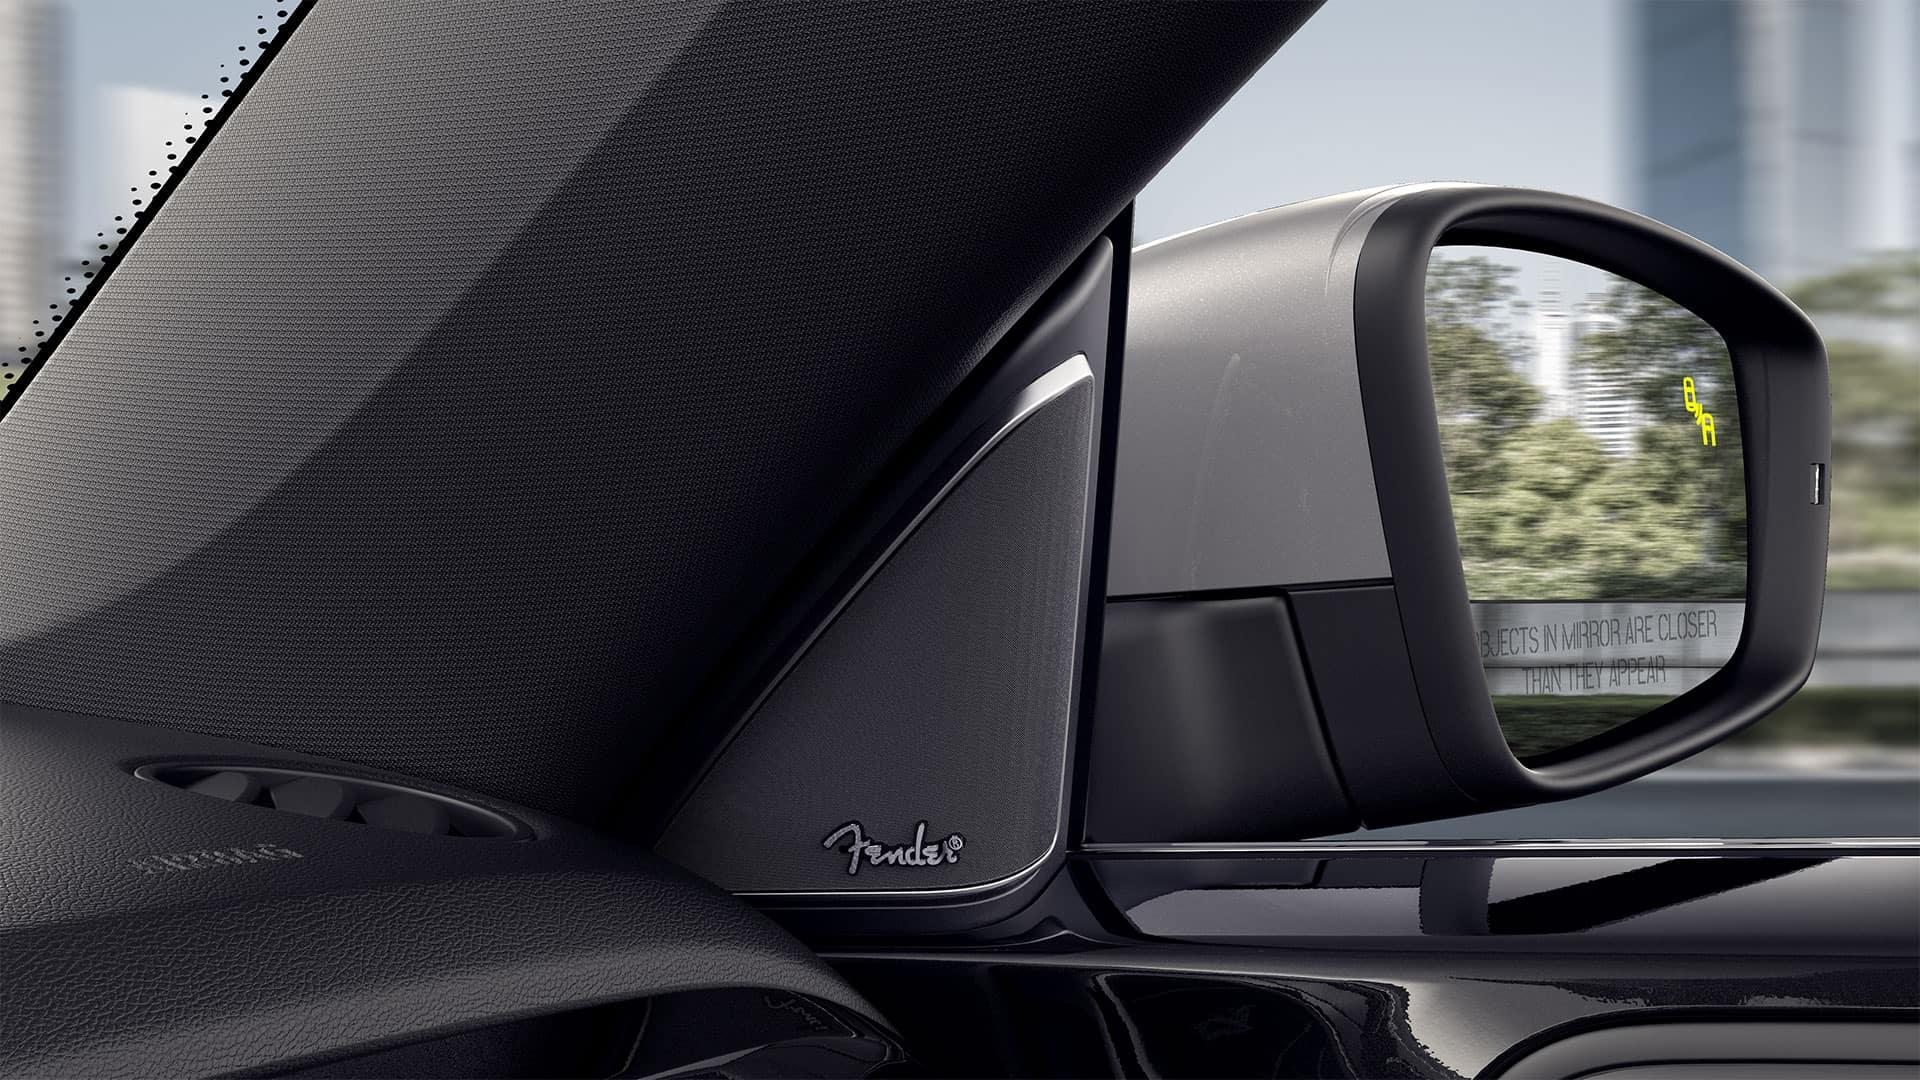 2019 VW Beetle Convertible fender audio